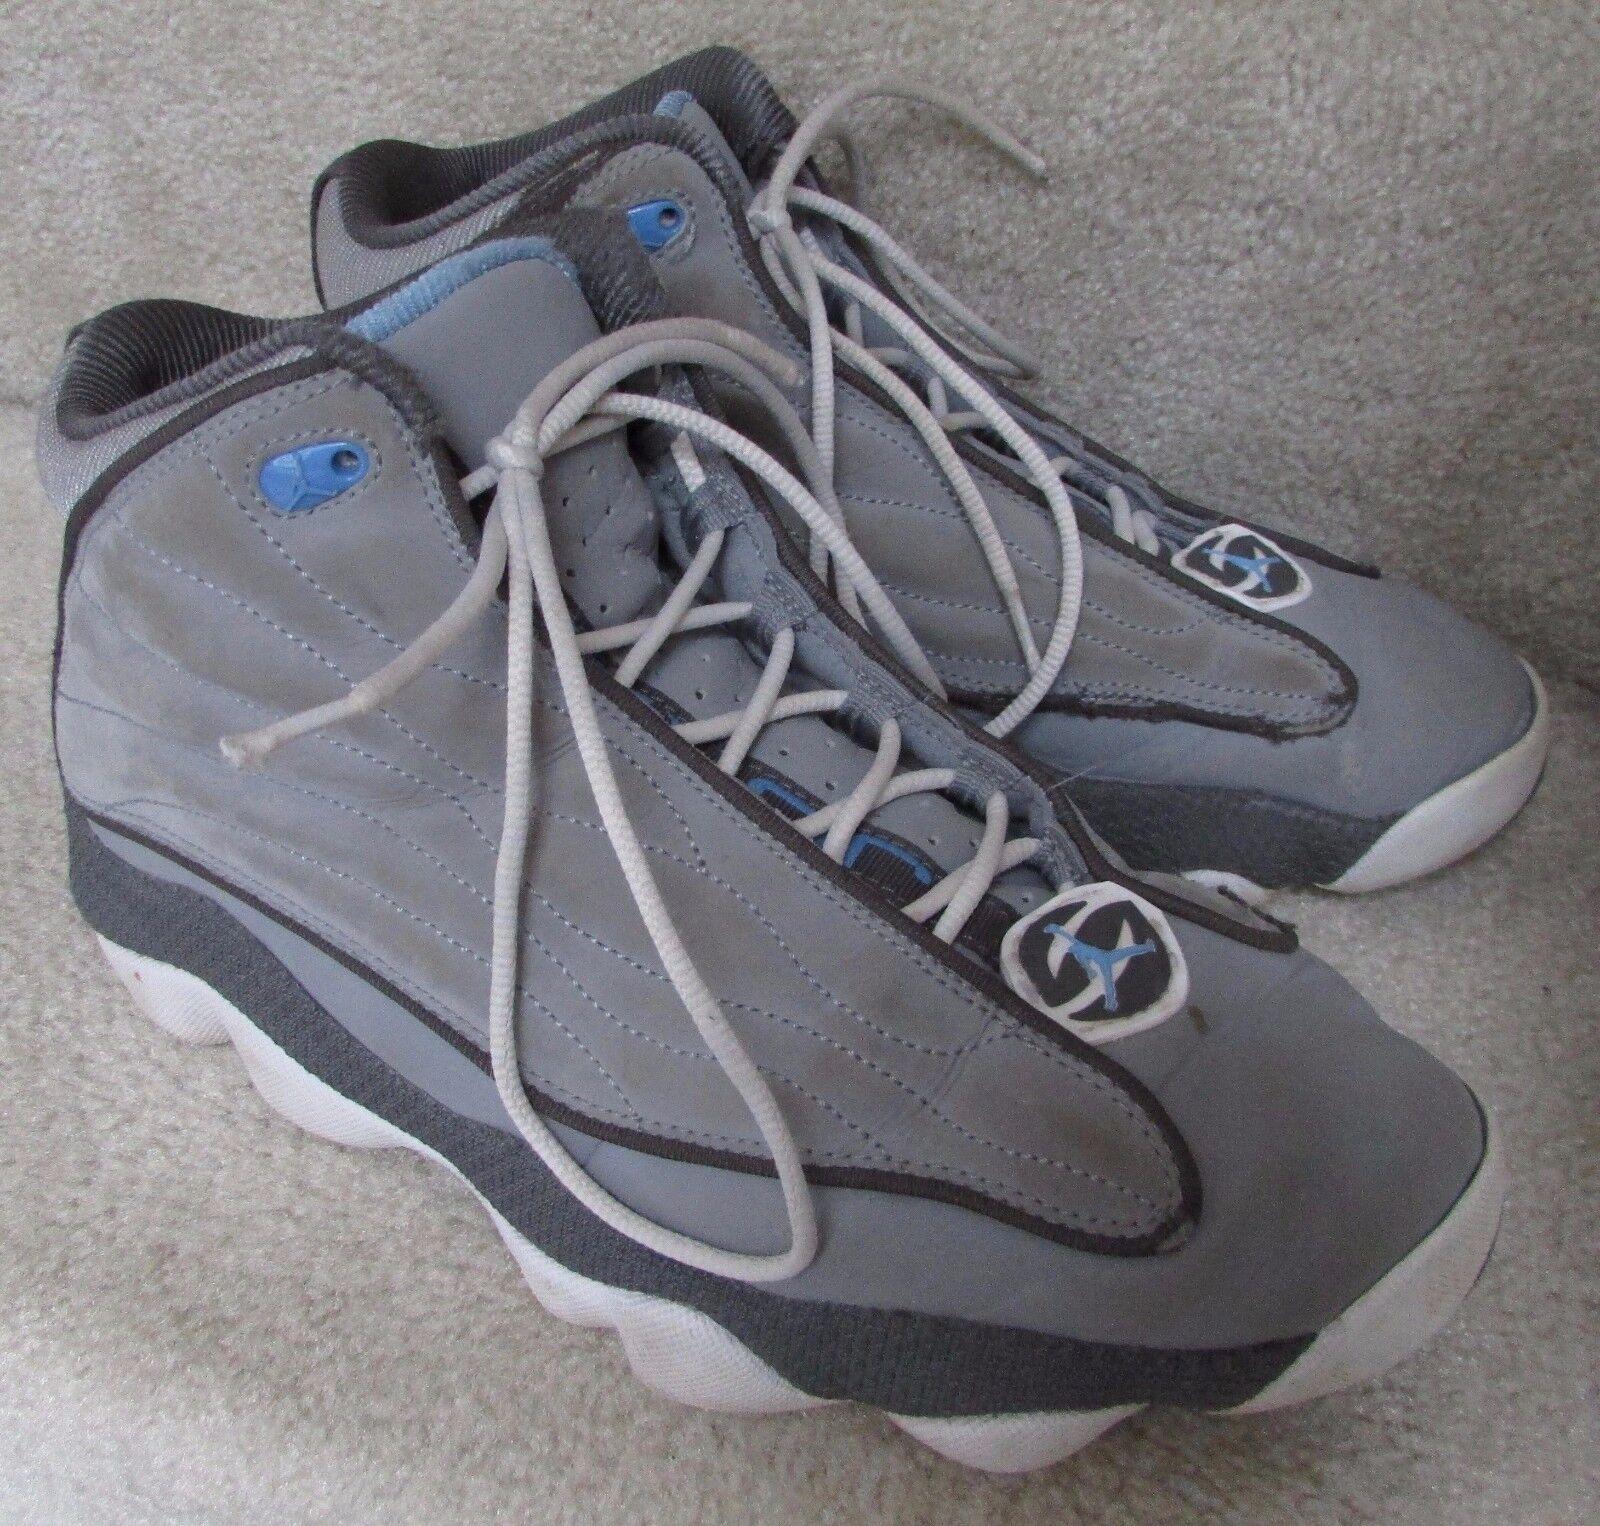 Nike Mens Jordan Pro Strength Basketball Shoes Sneakers Size 8.5 Gra